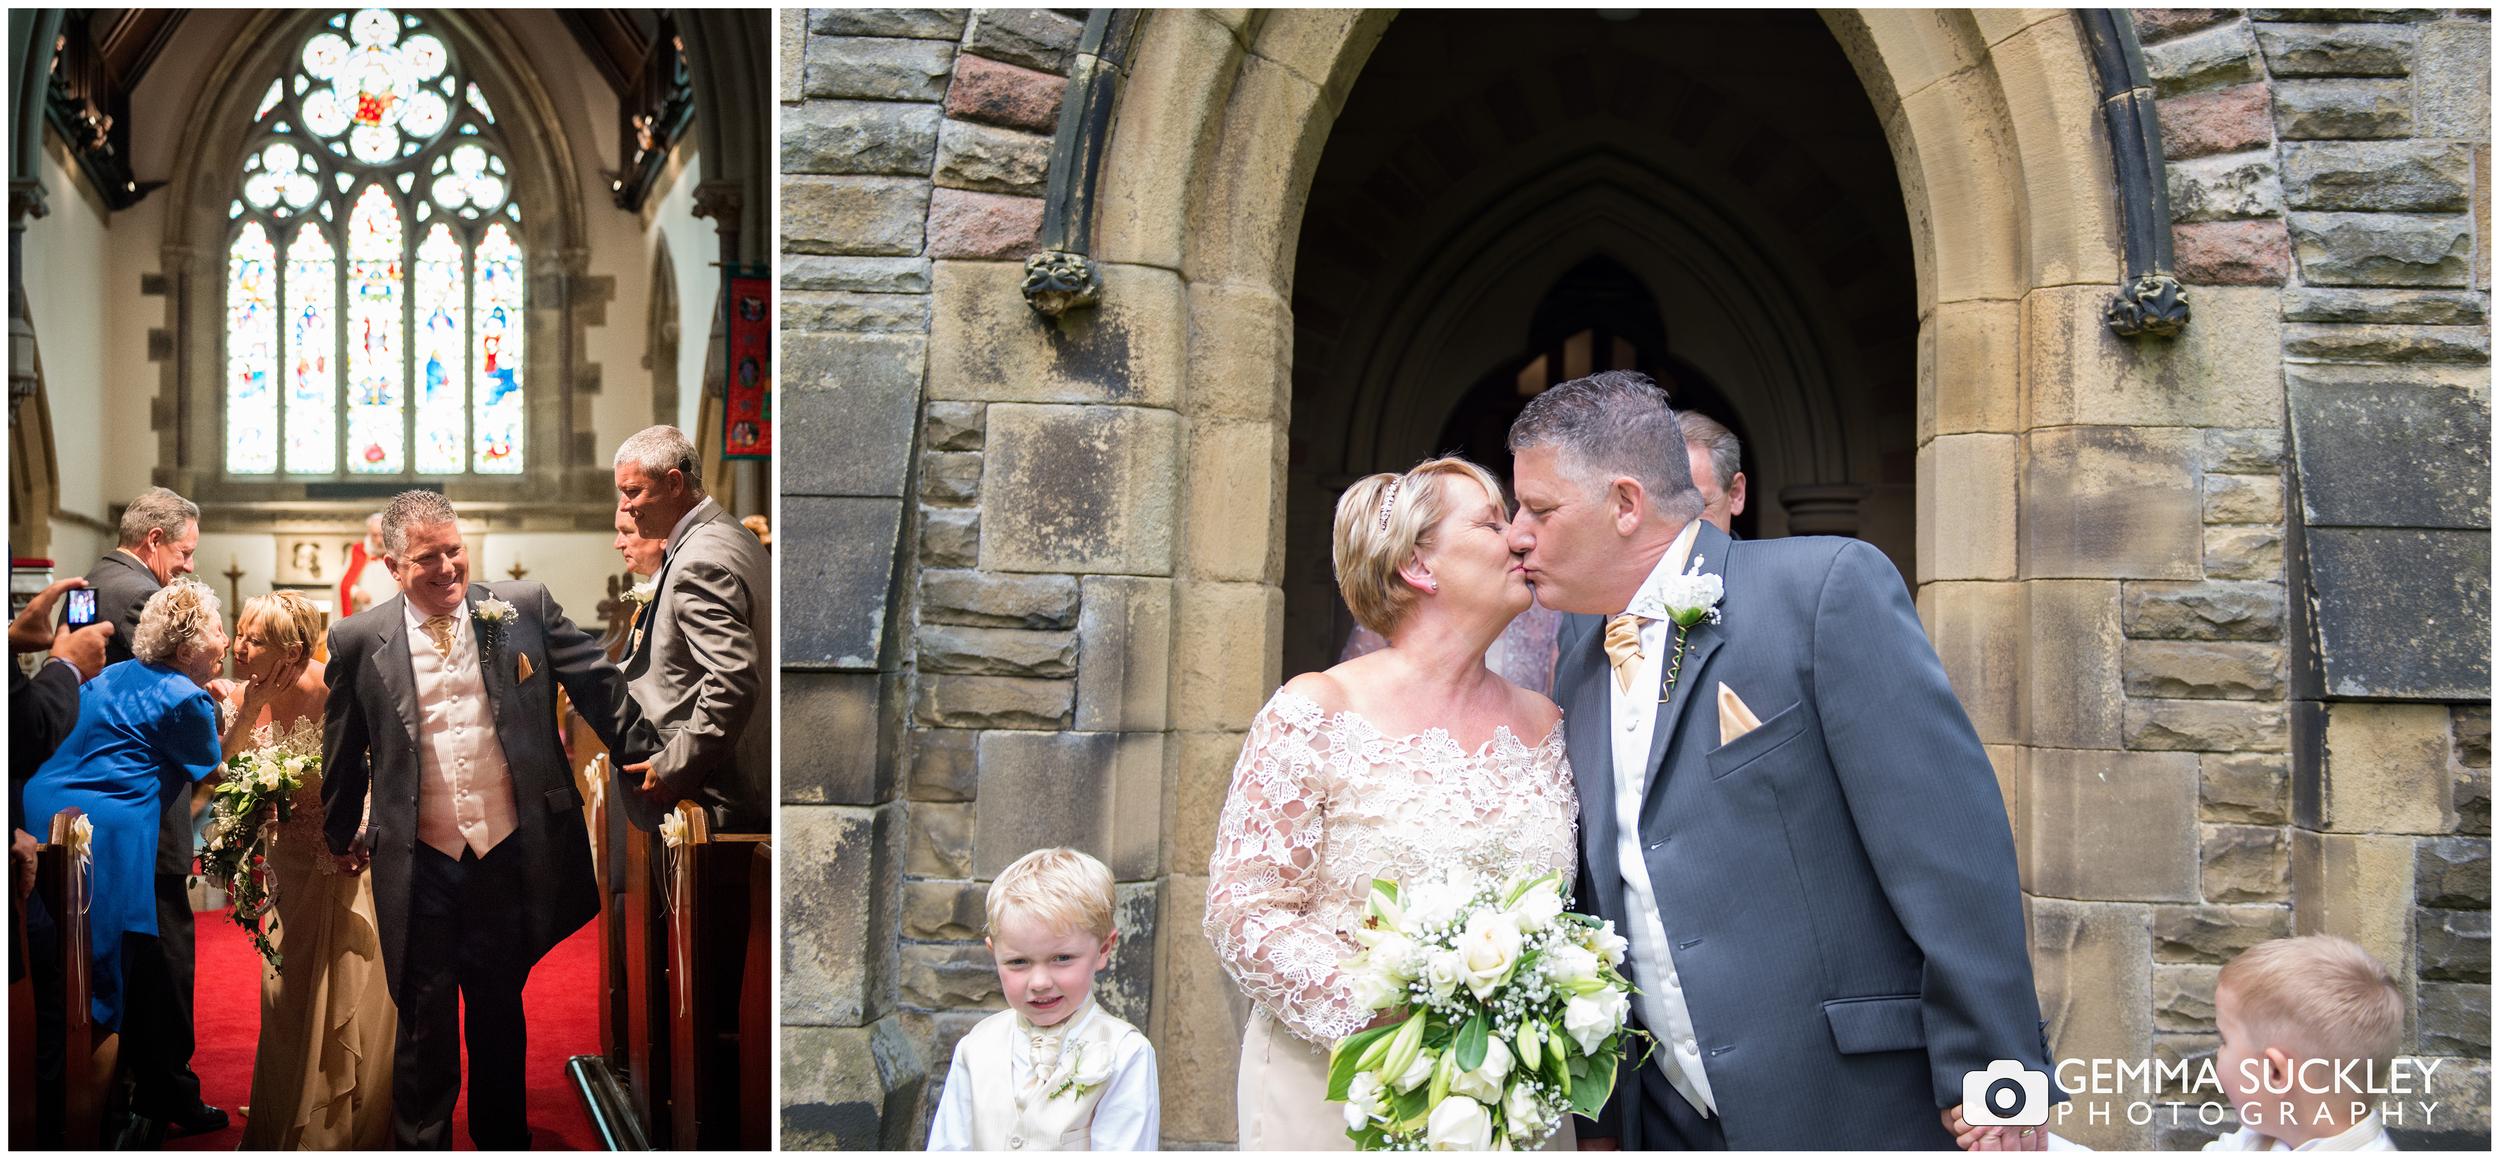 carleton-church-skipton-wedding-photographerDSC_9574.jpg